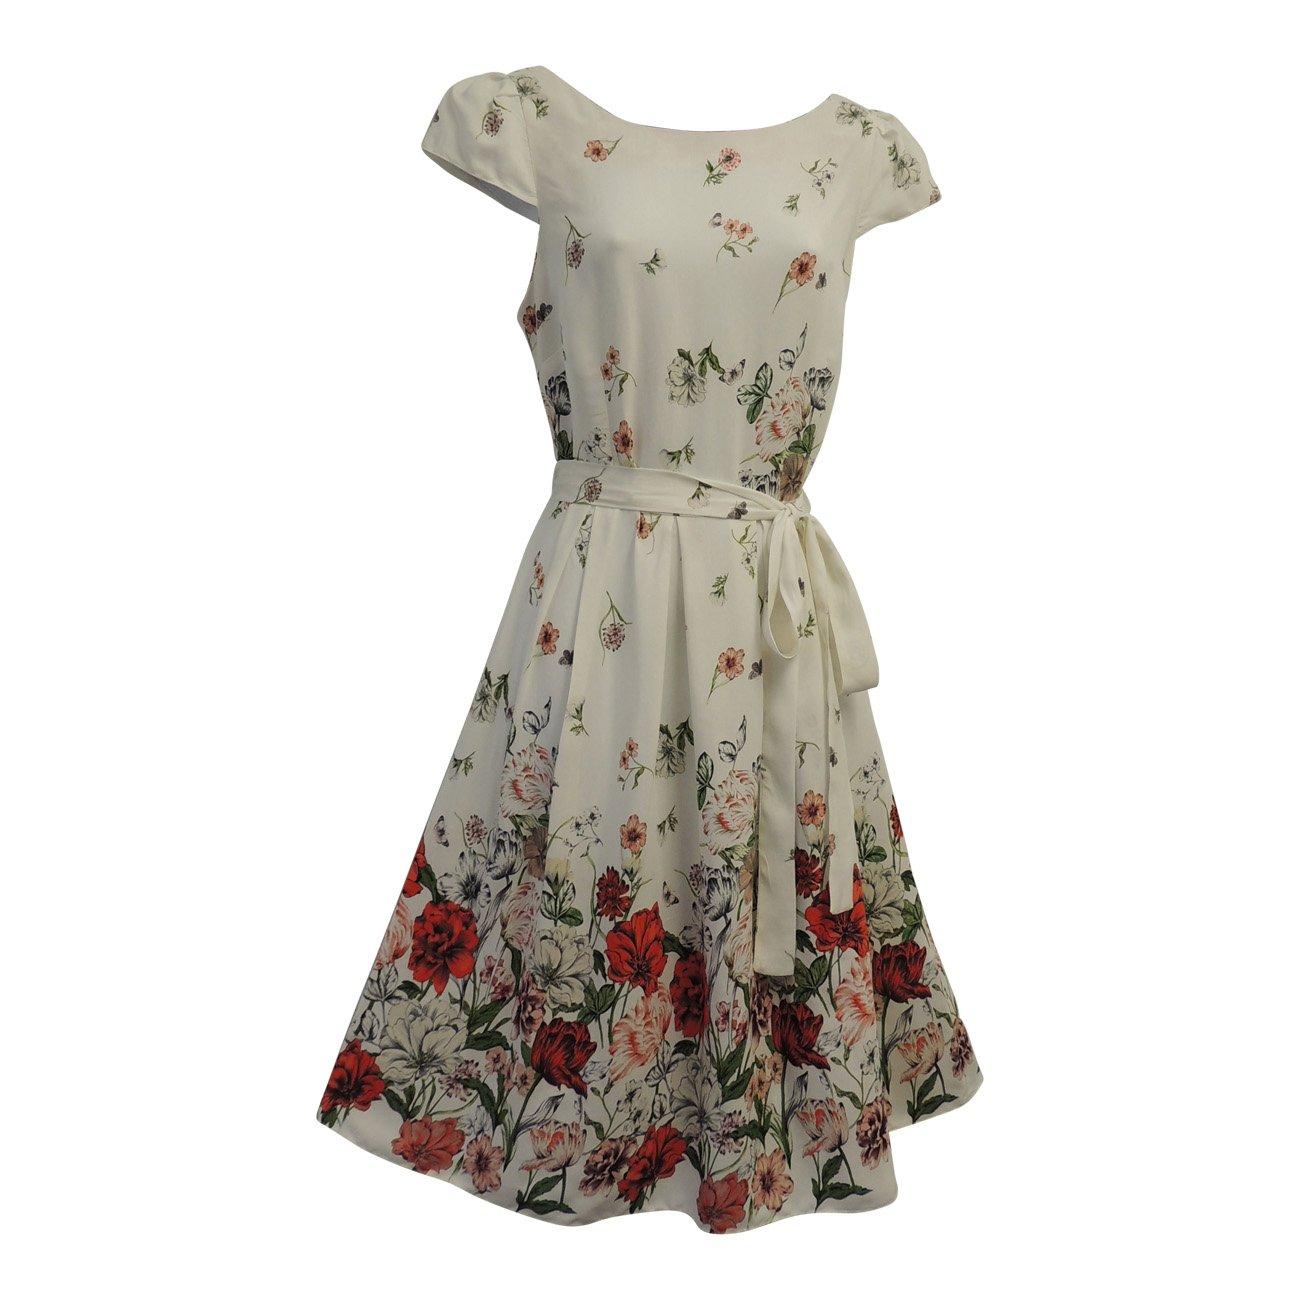 36c4cb3c626f39 New White Floral WWII 1930's/1940's VTG Style Land Girl Swing Tea Dress: Rosa  Rosa: Amazon.co.uk: Clothing